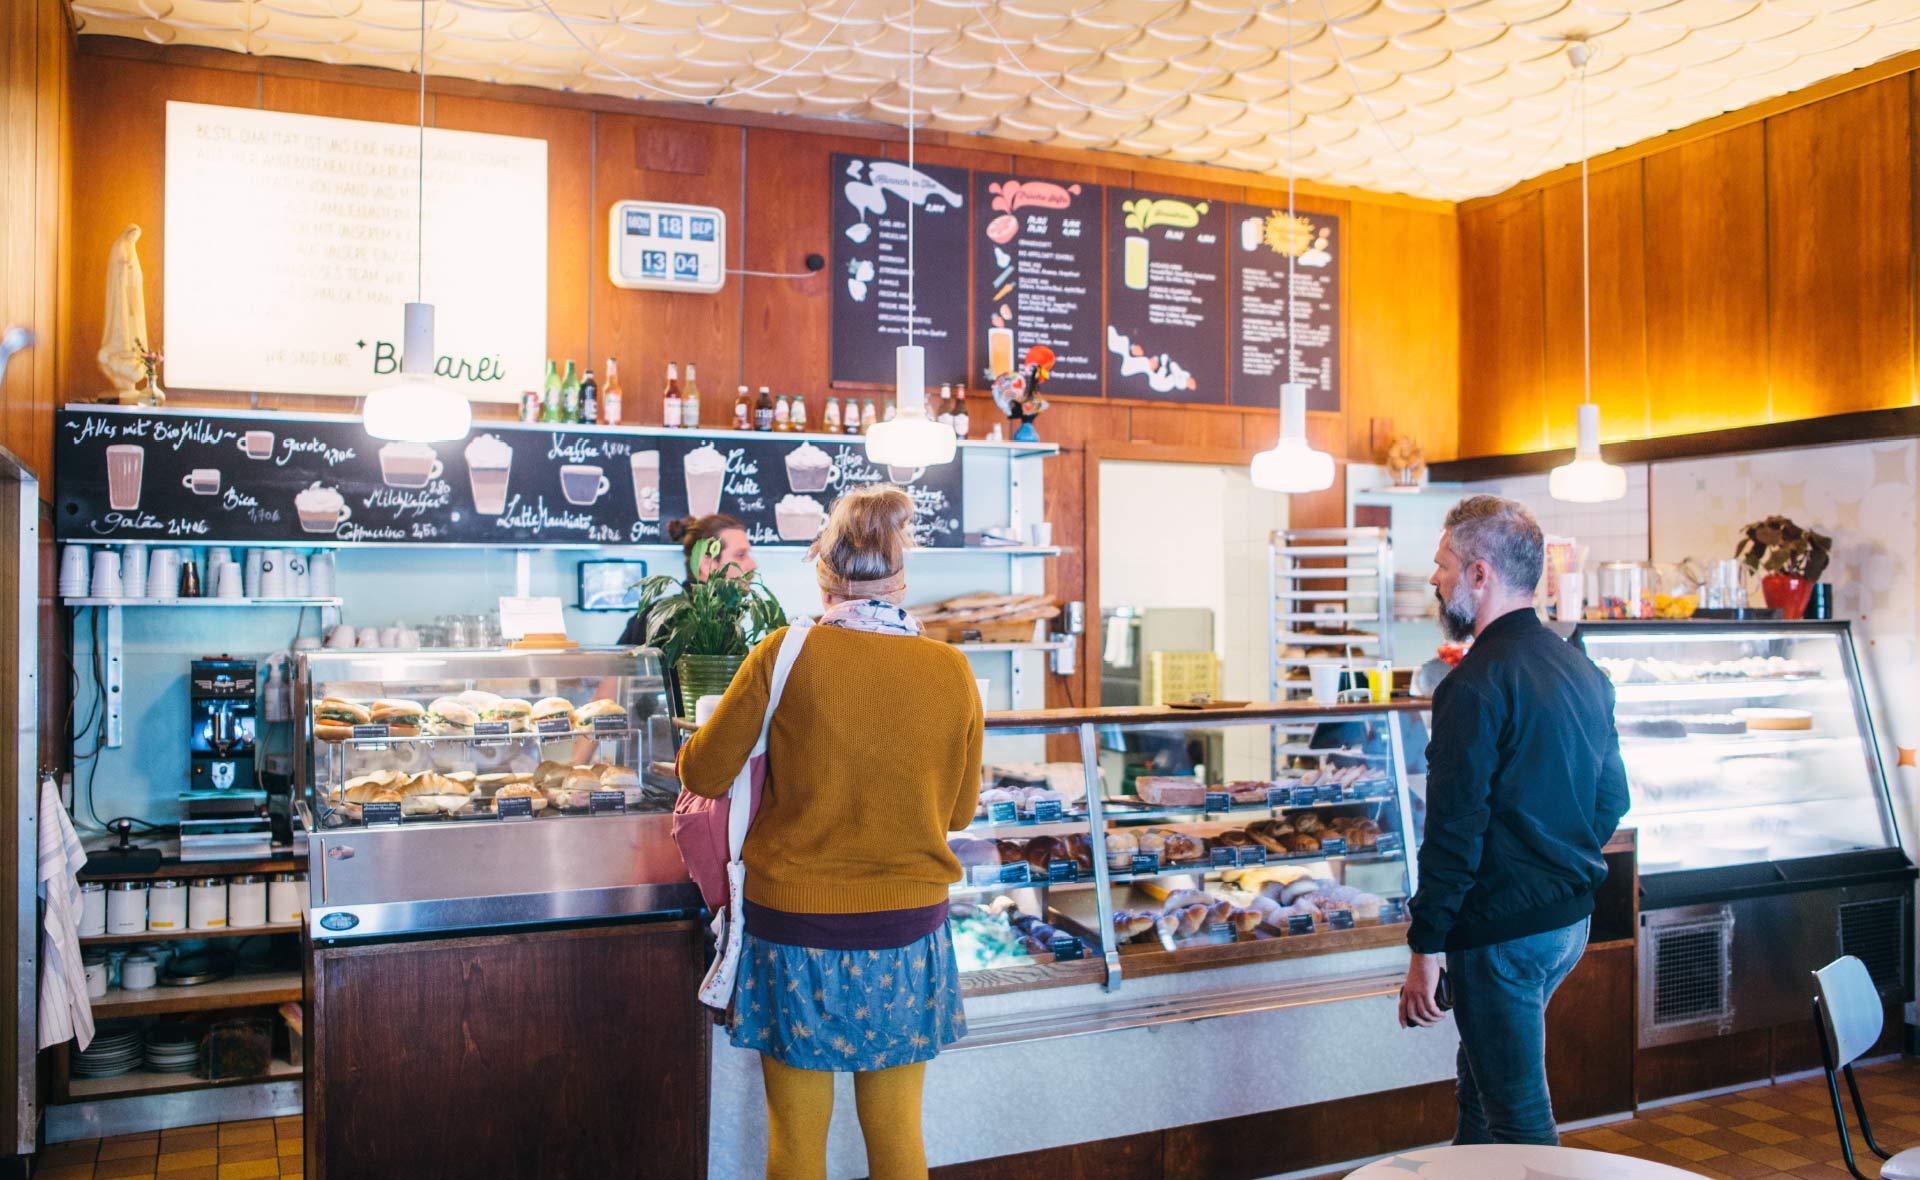 Besuche uns im Café Bekarei